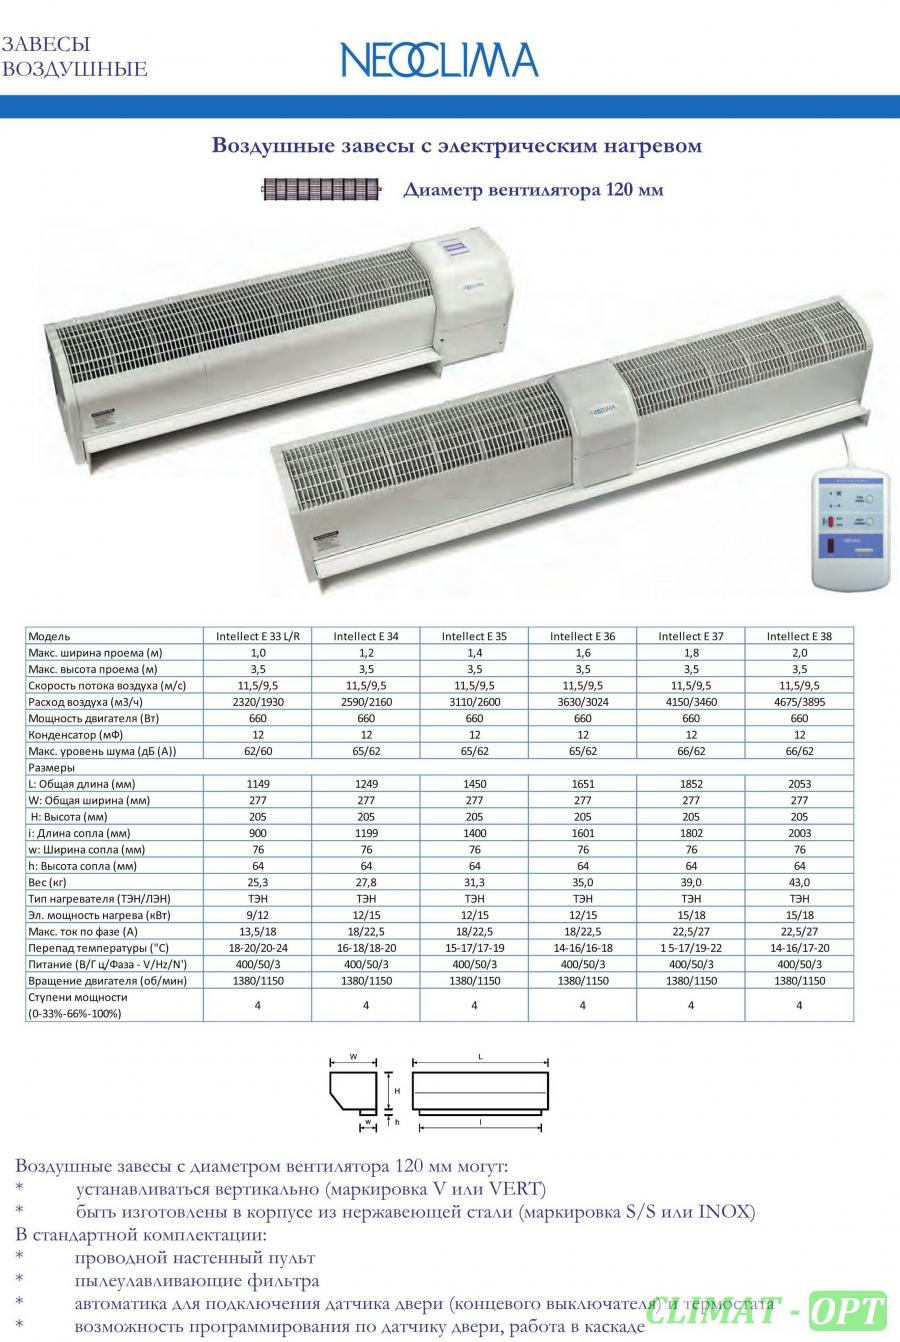 Тепловая завеса с электрическим нагревом Neoclima Intellect E L/R IOB